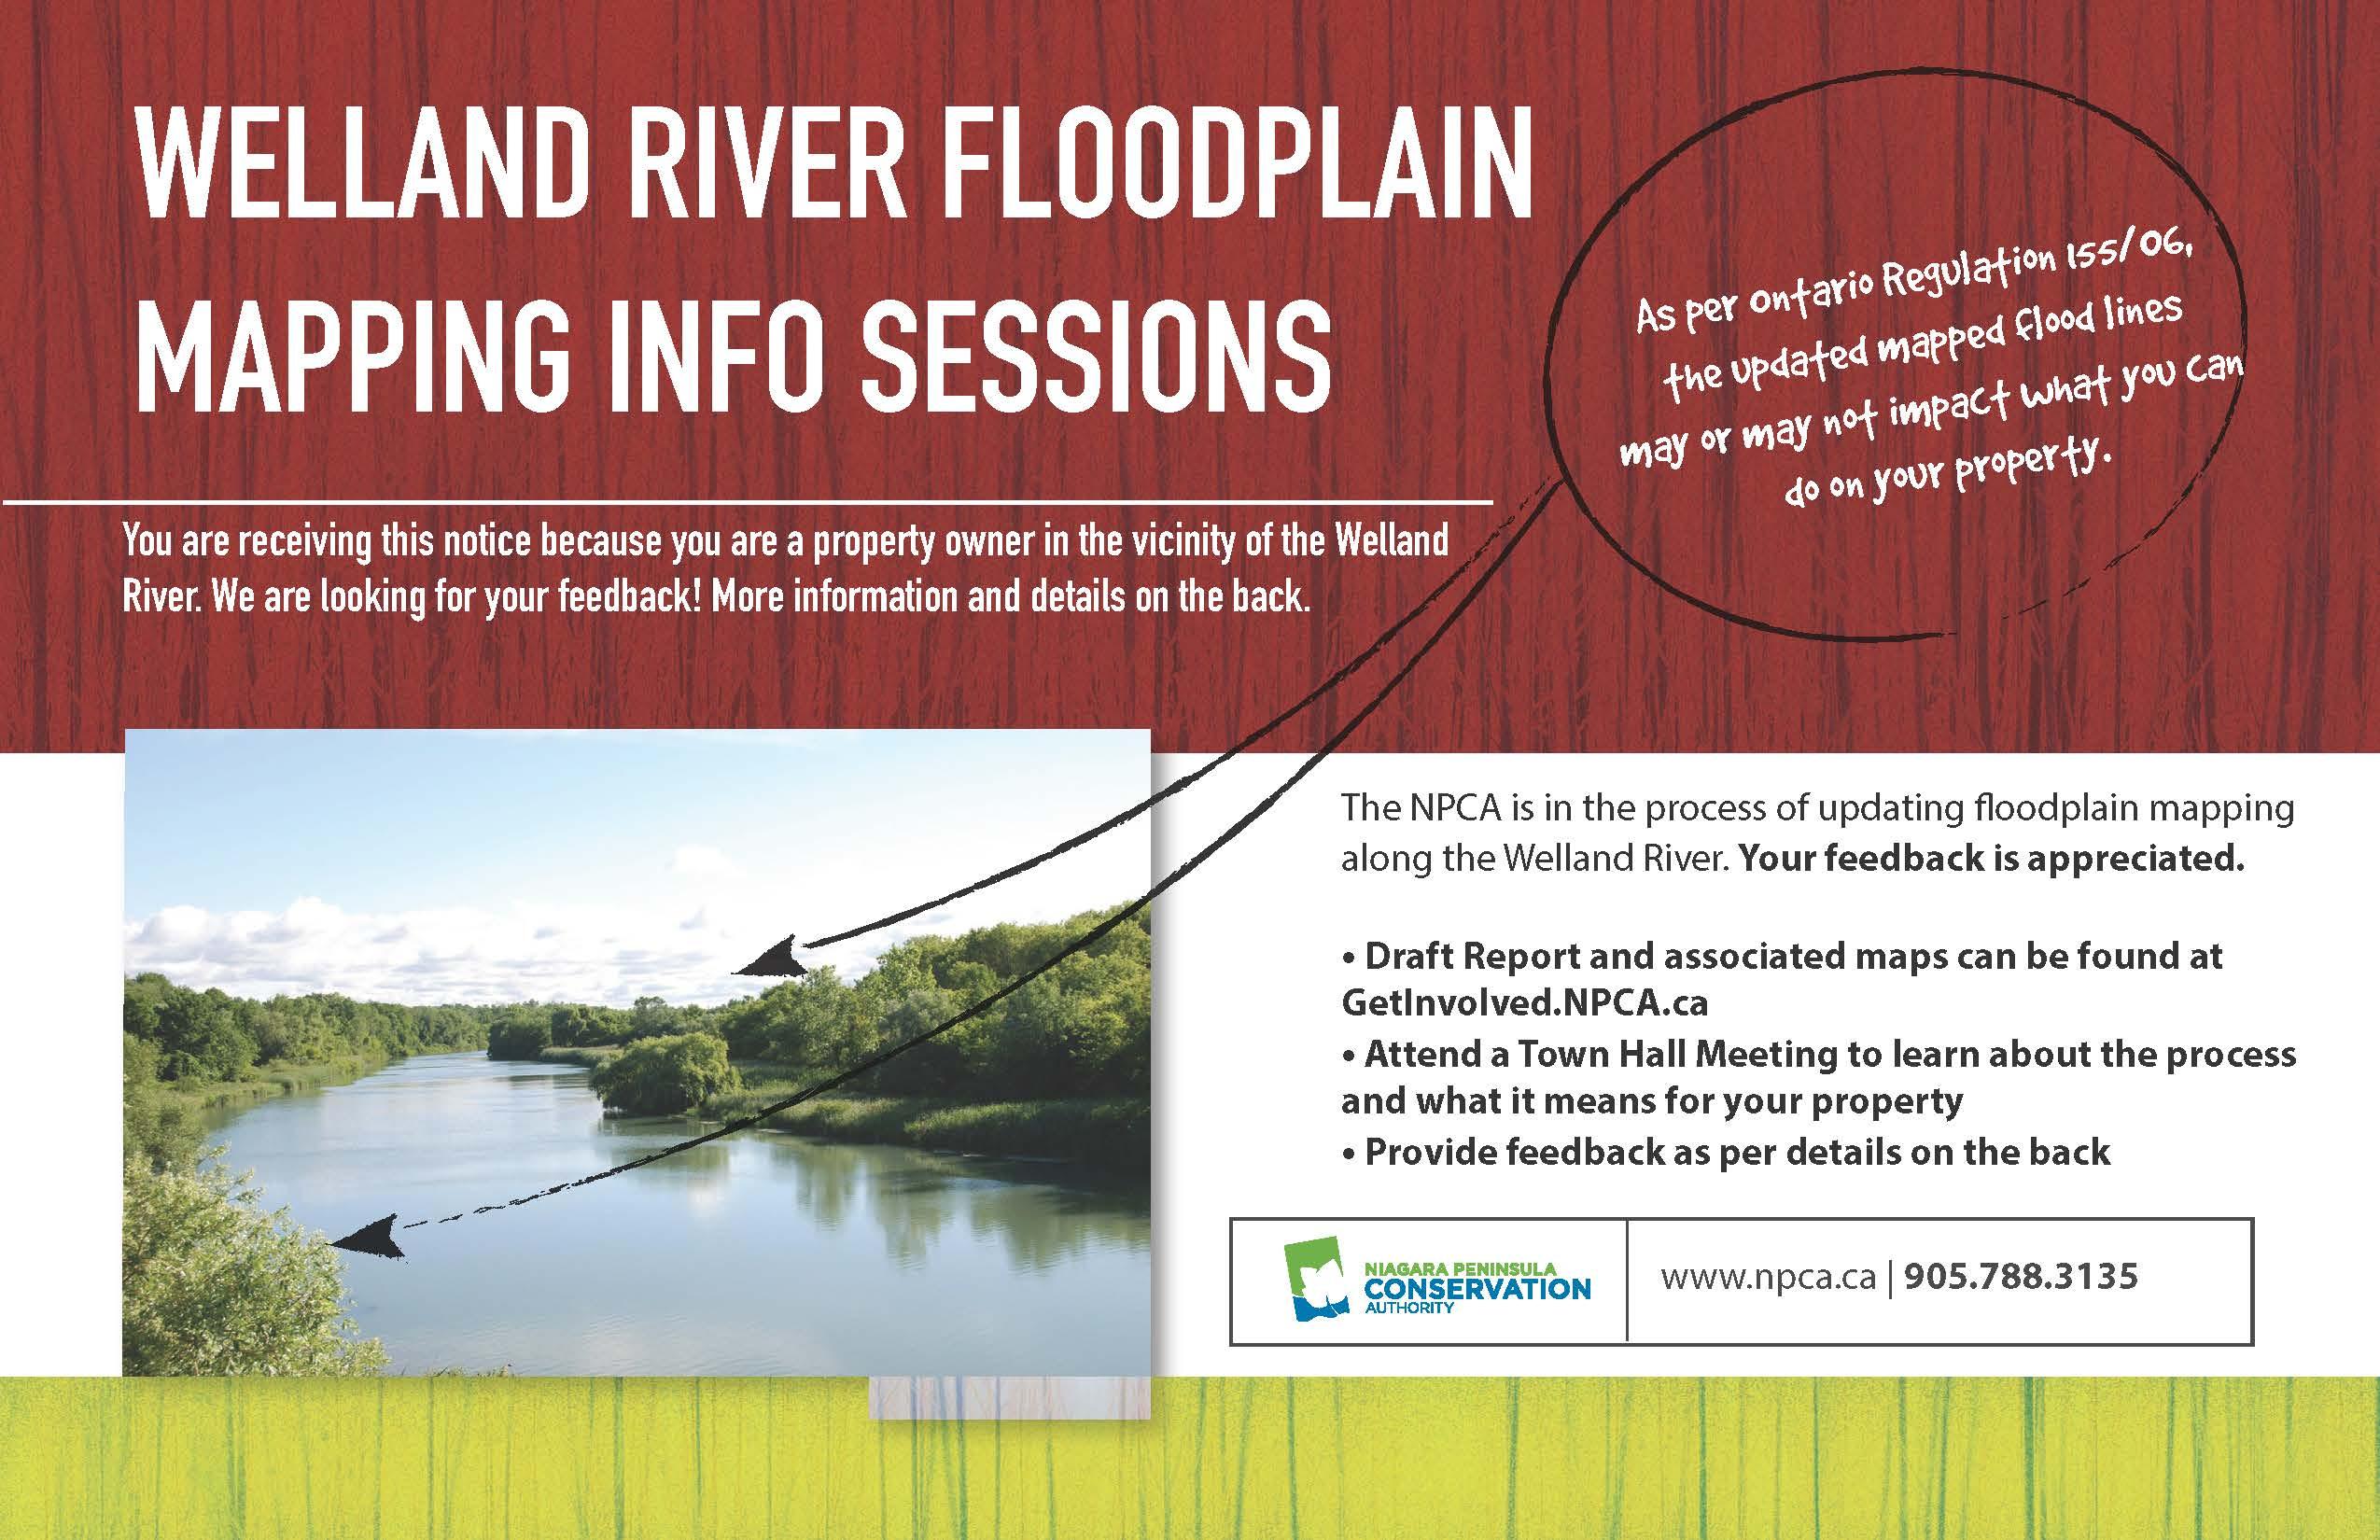 2019 NPCA Welland River Floodplain Mapping Notice 8